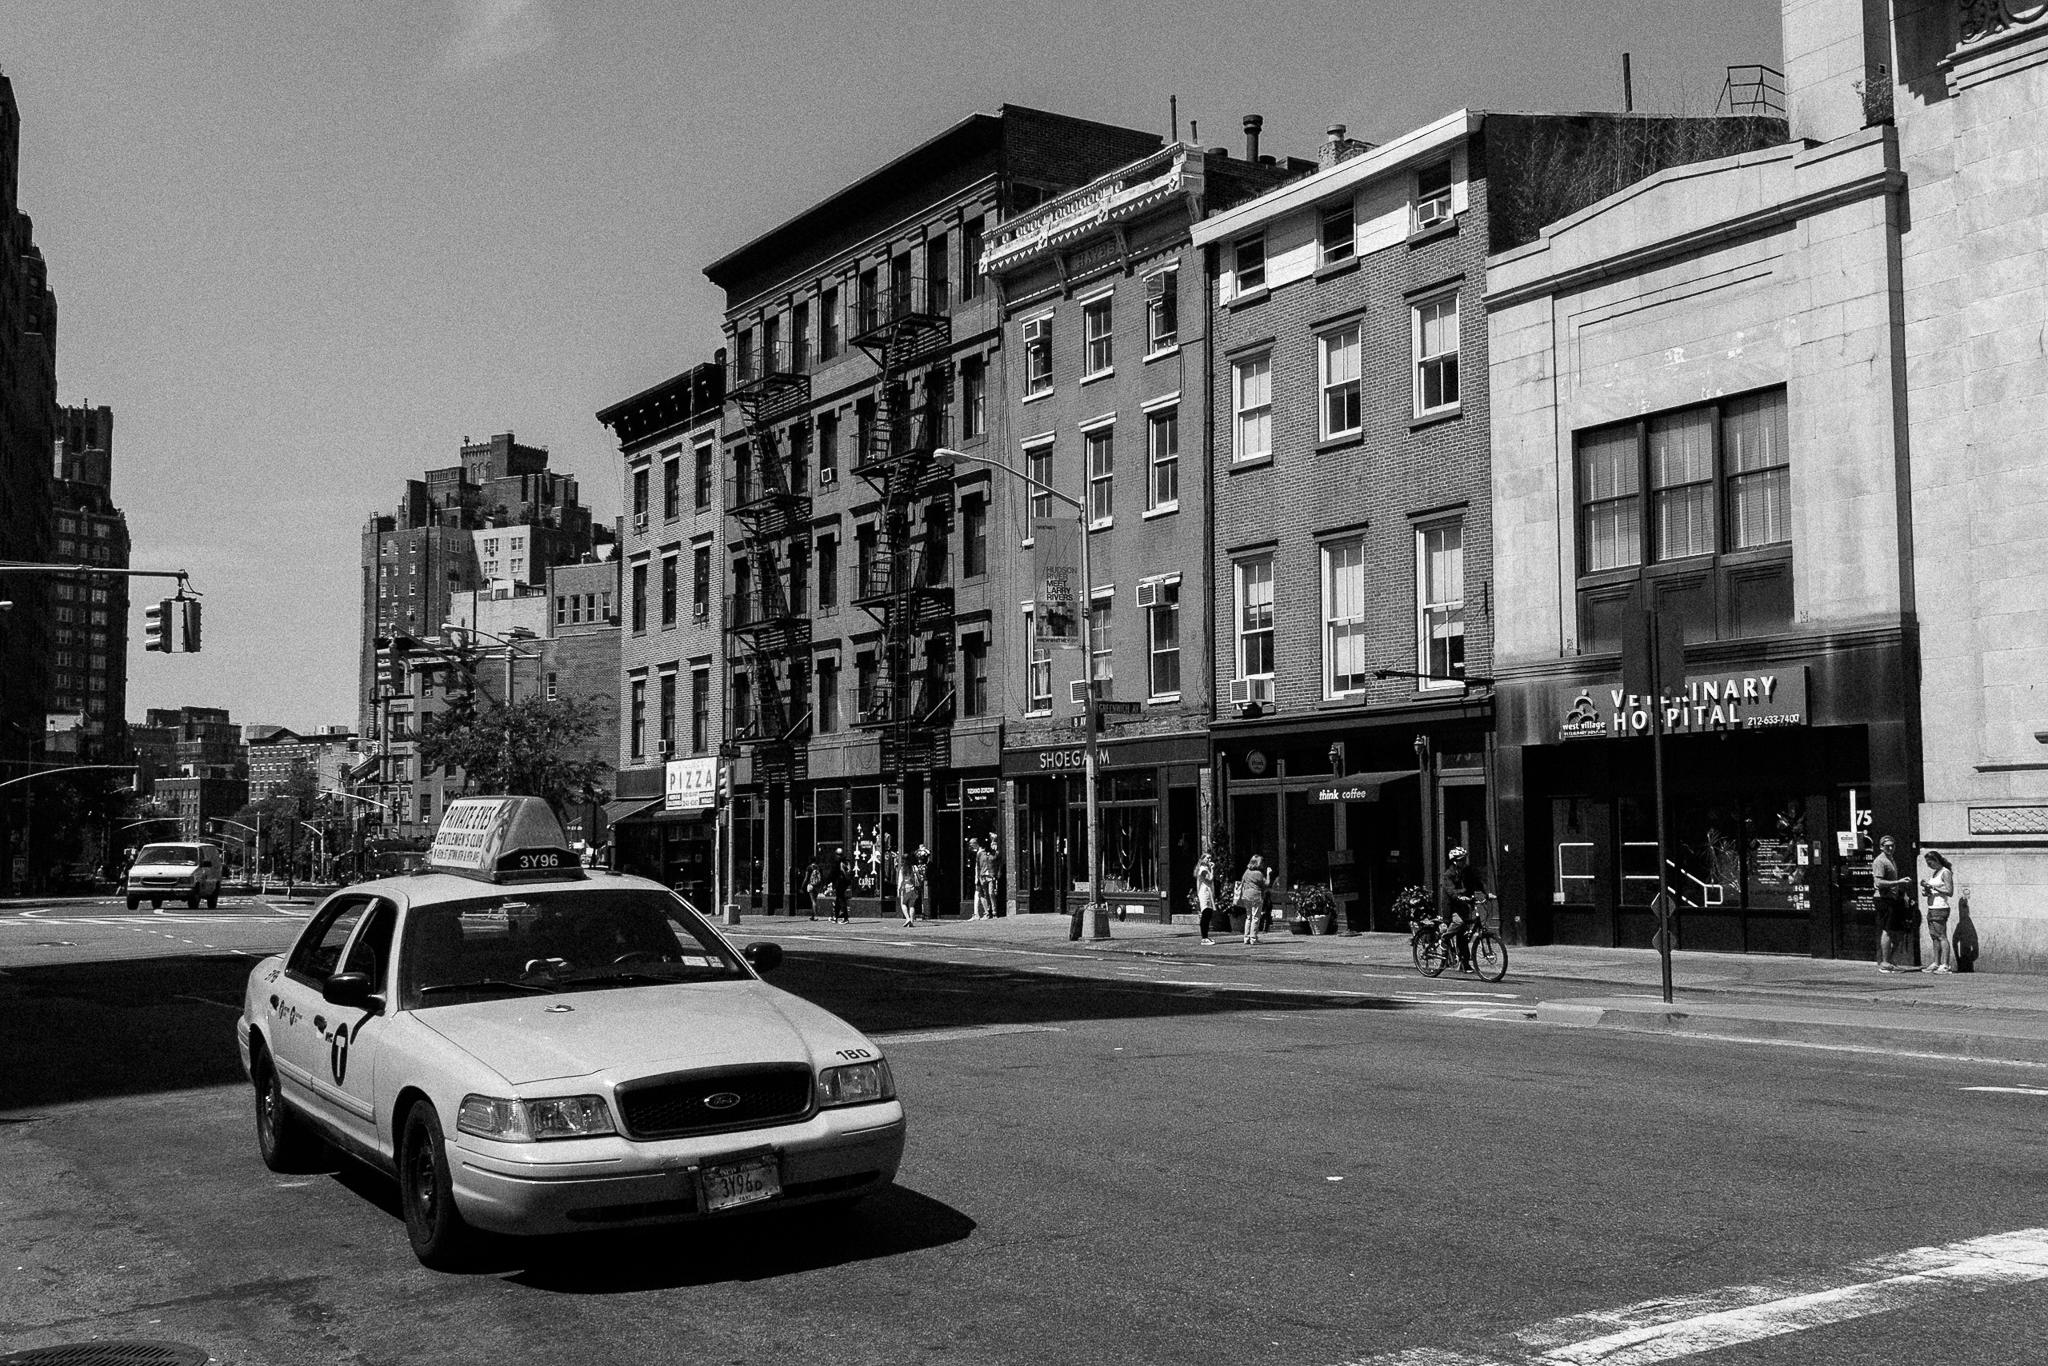 2015-05-14-NYC-4416.jpg